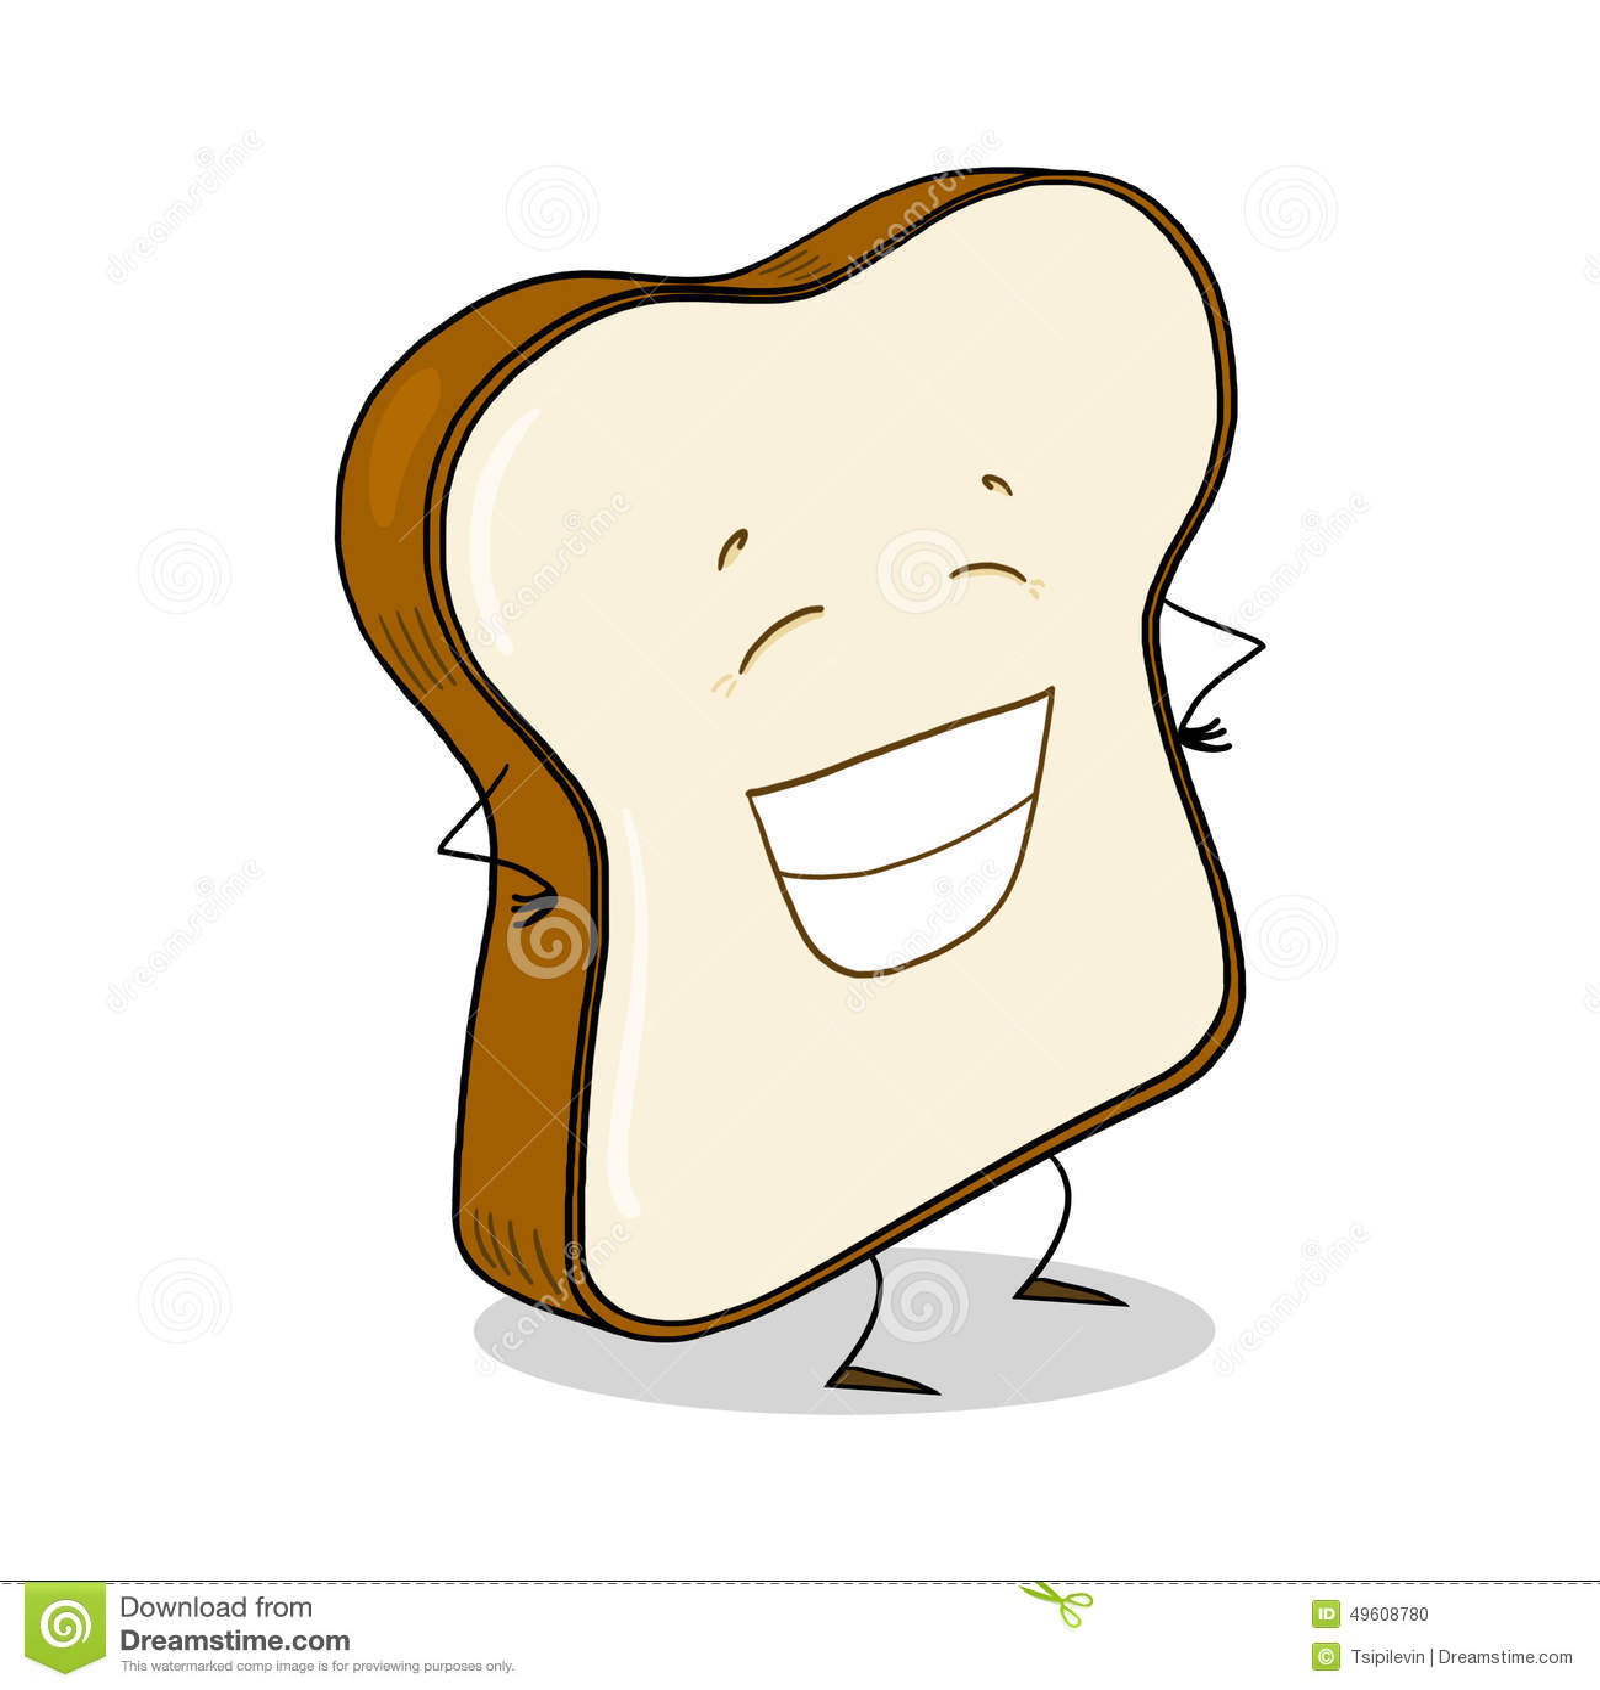 White Bread Slice Illustration Stock Illustration - Image ...